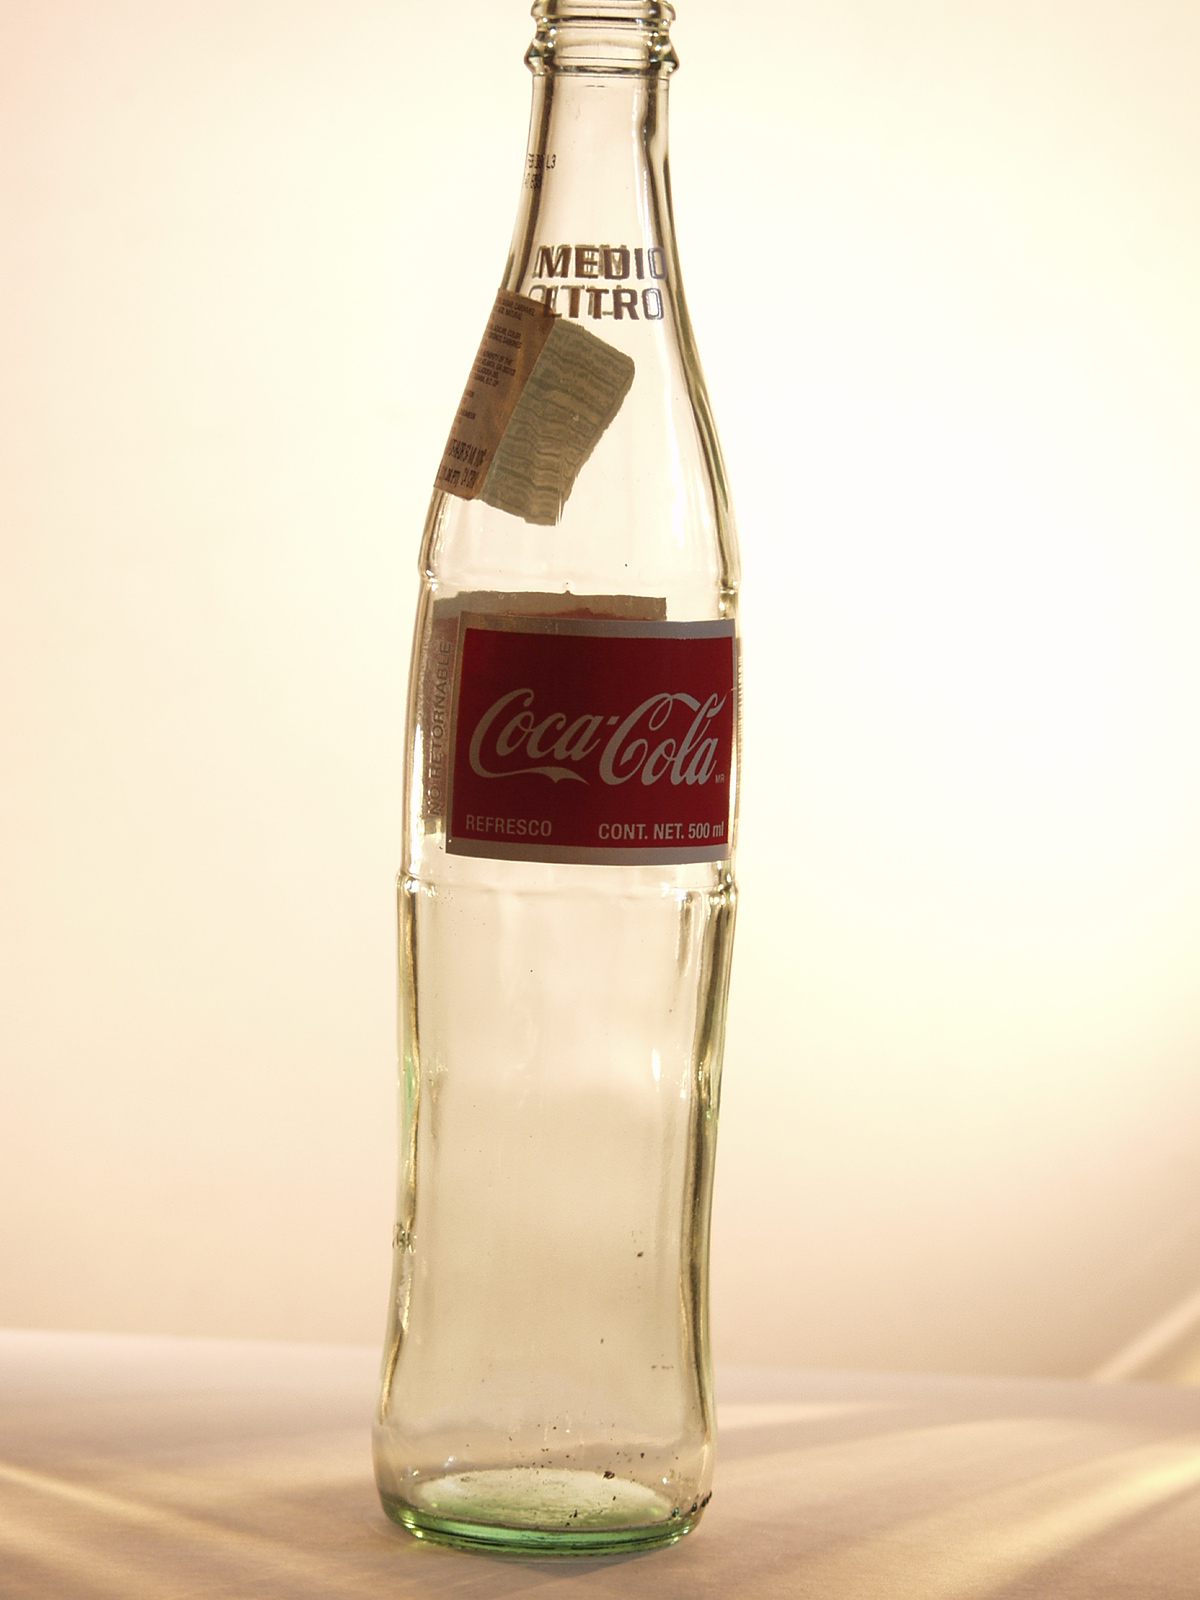 Coca cola bottle photo